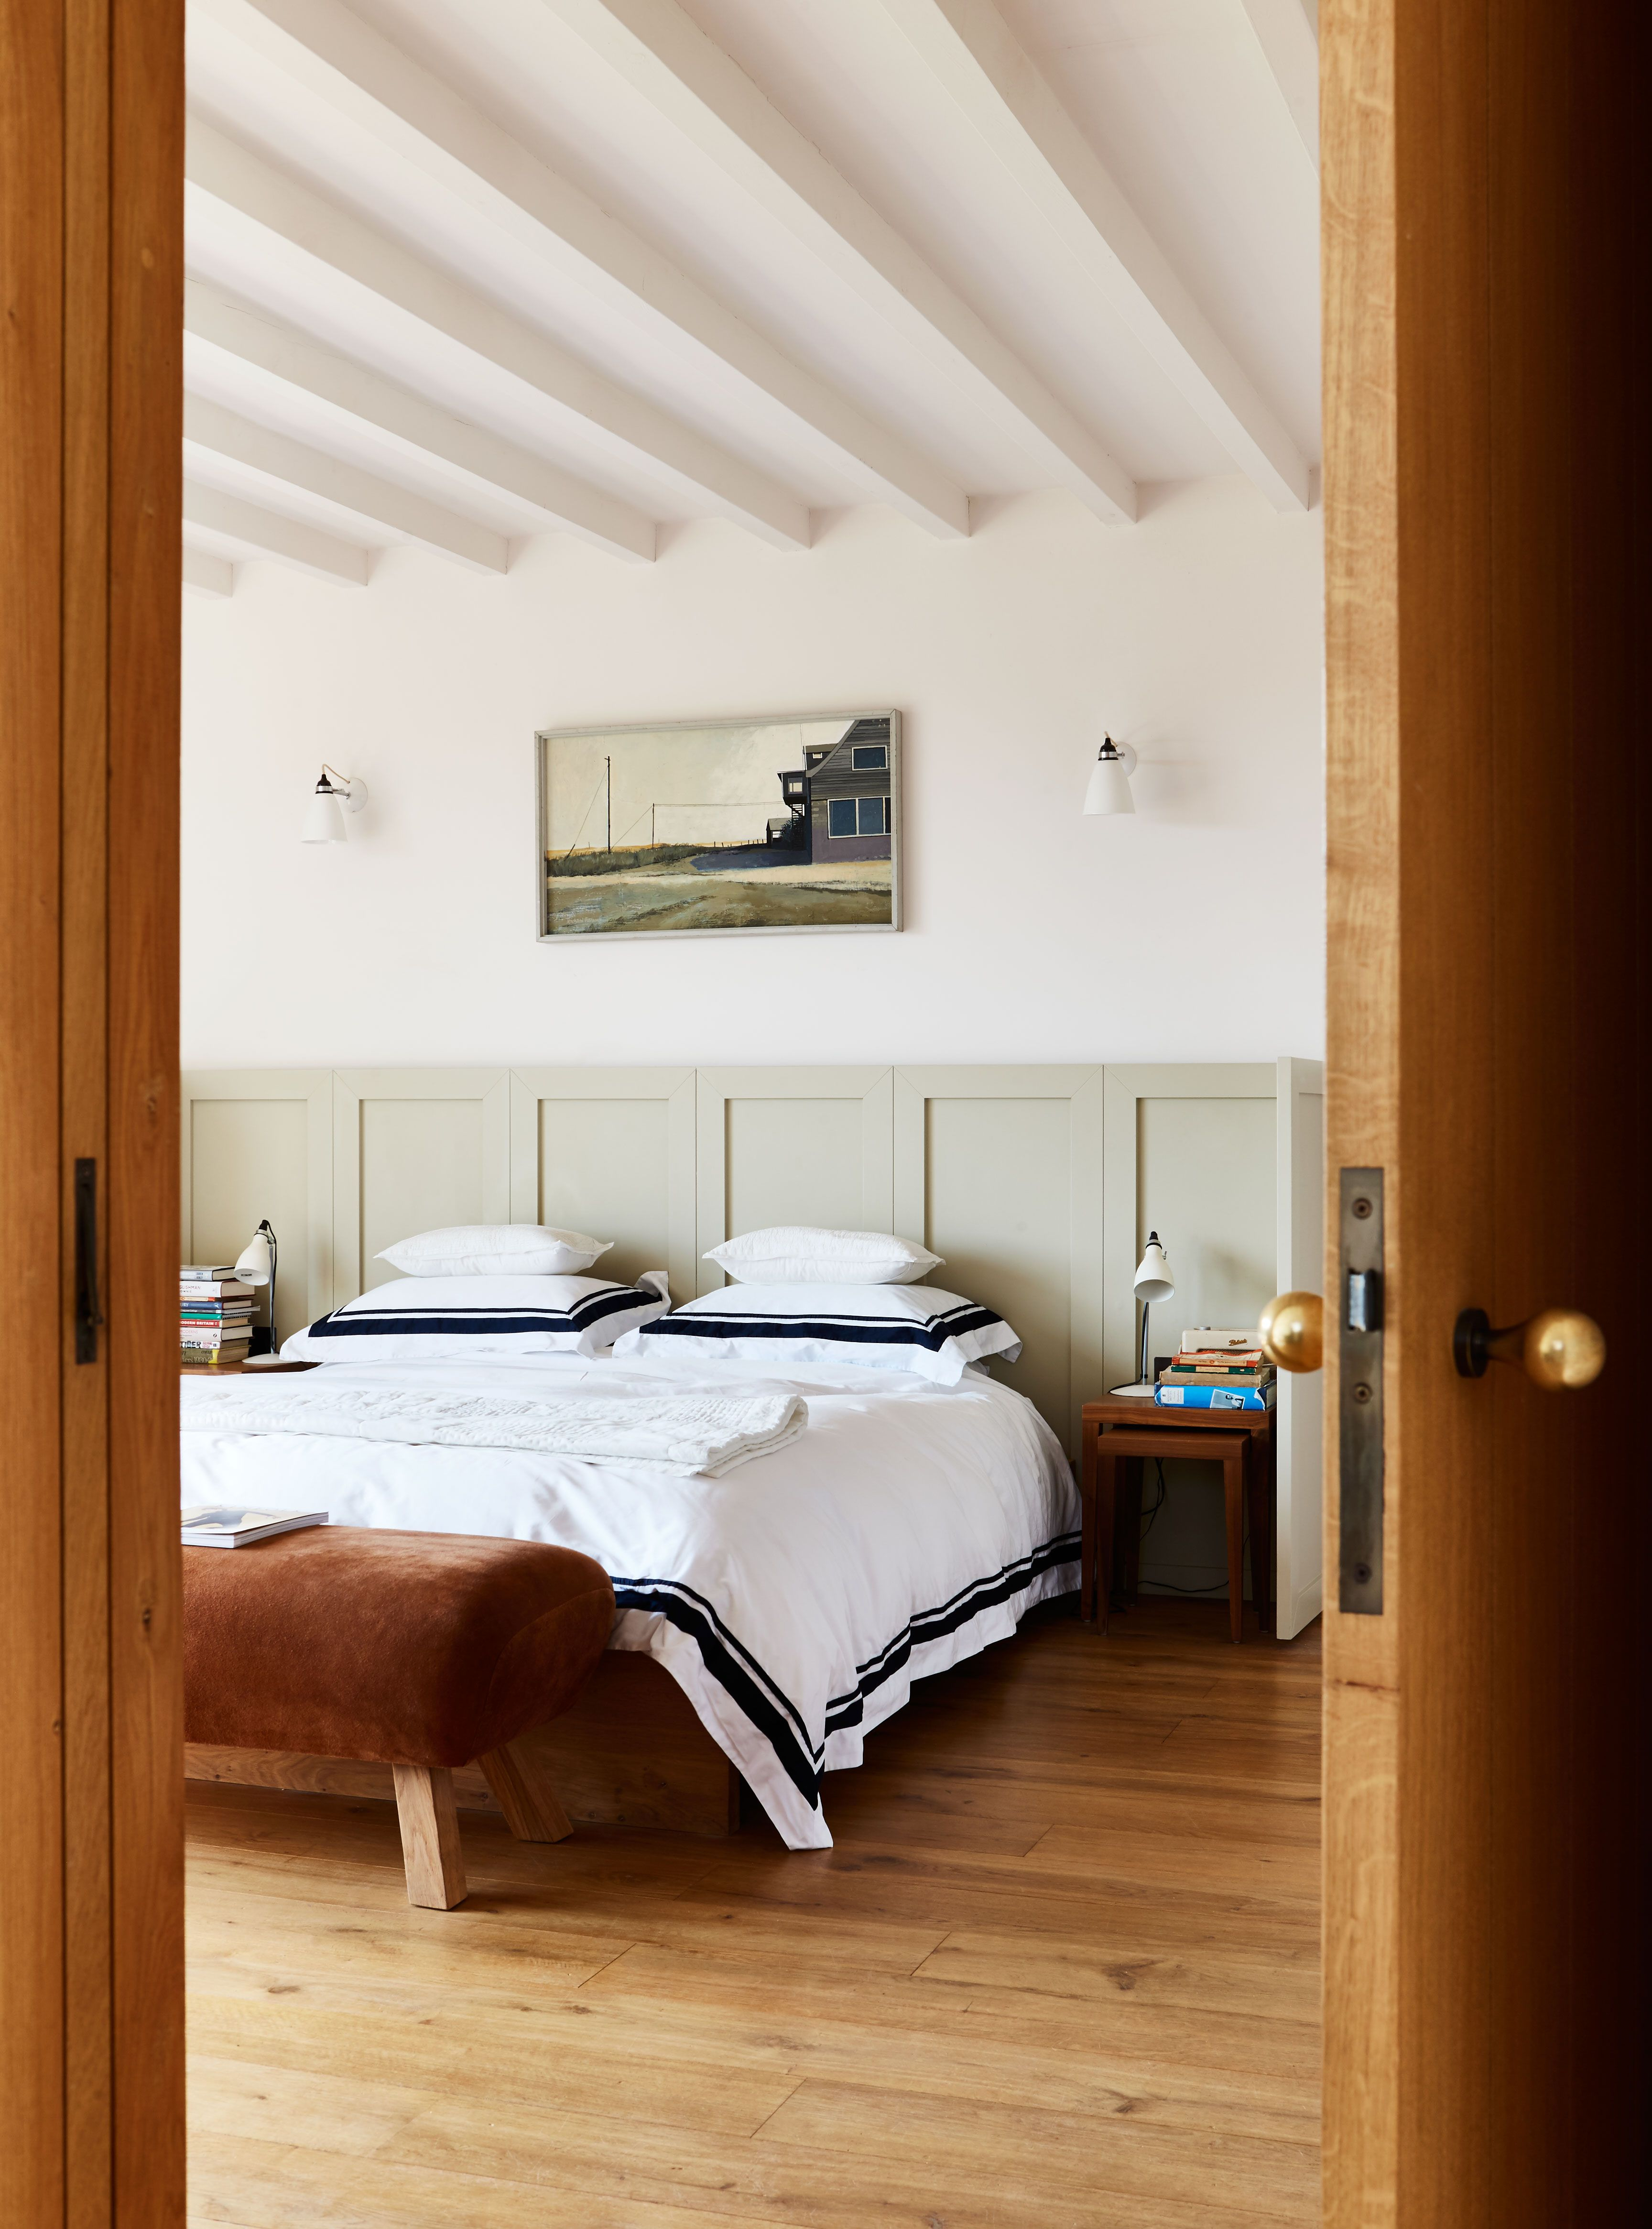 40 beautiful bedroom decorating ideas modern bedroom ideas rh housebeautiful com images of beautiful romantic bedrooms pictures of beautiful guest bedrooms